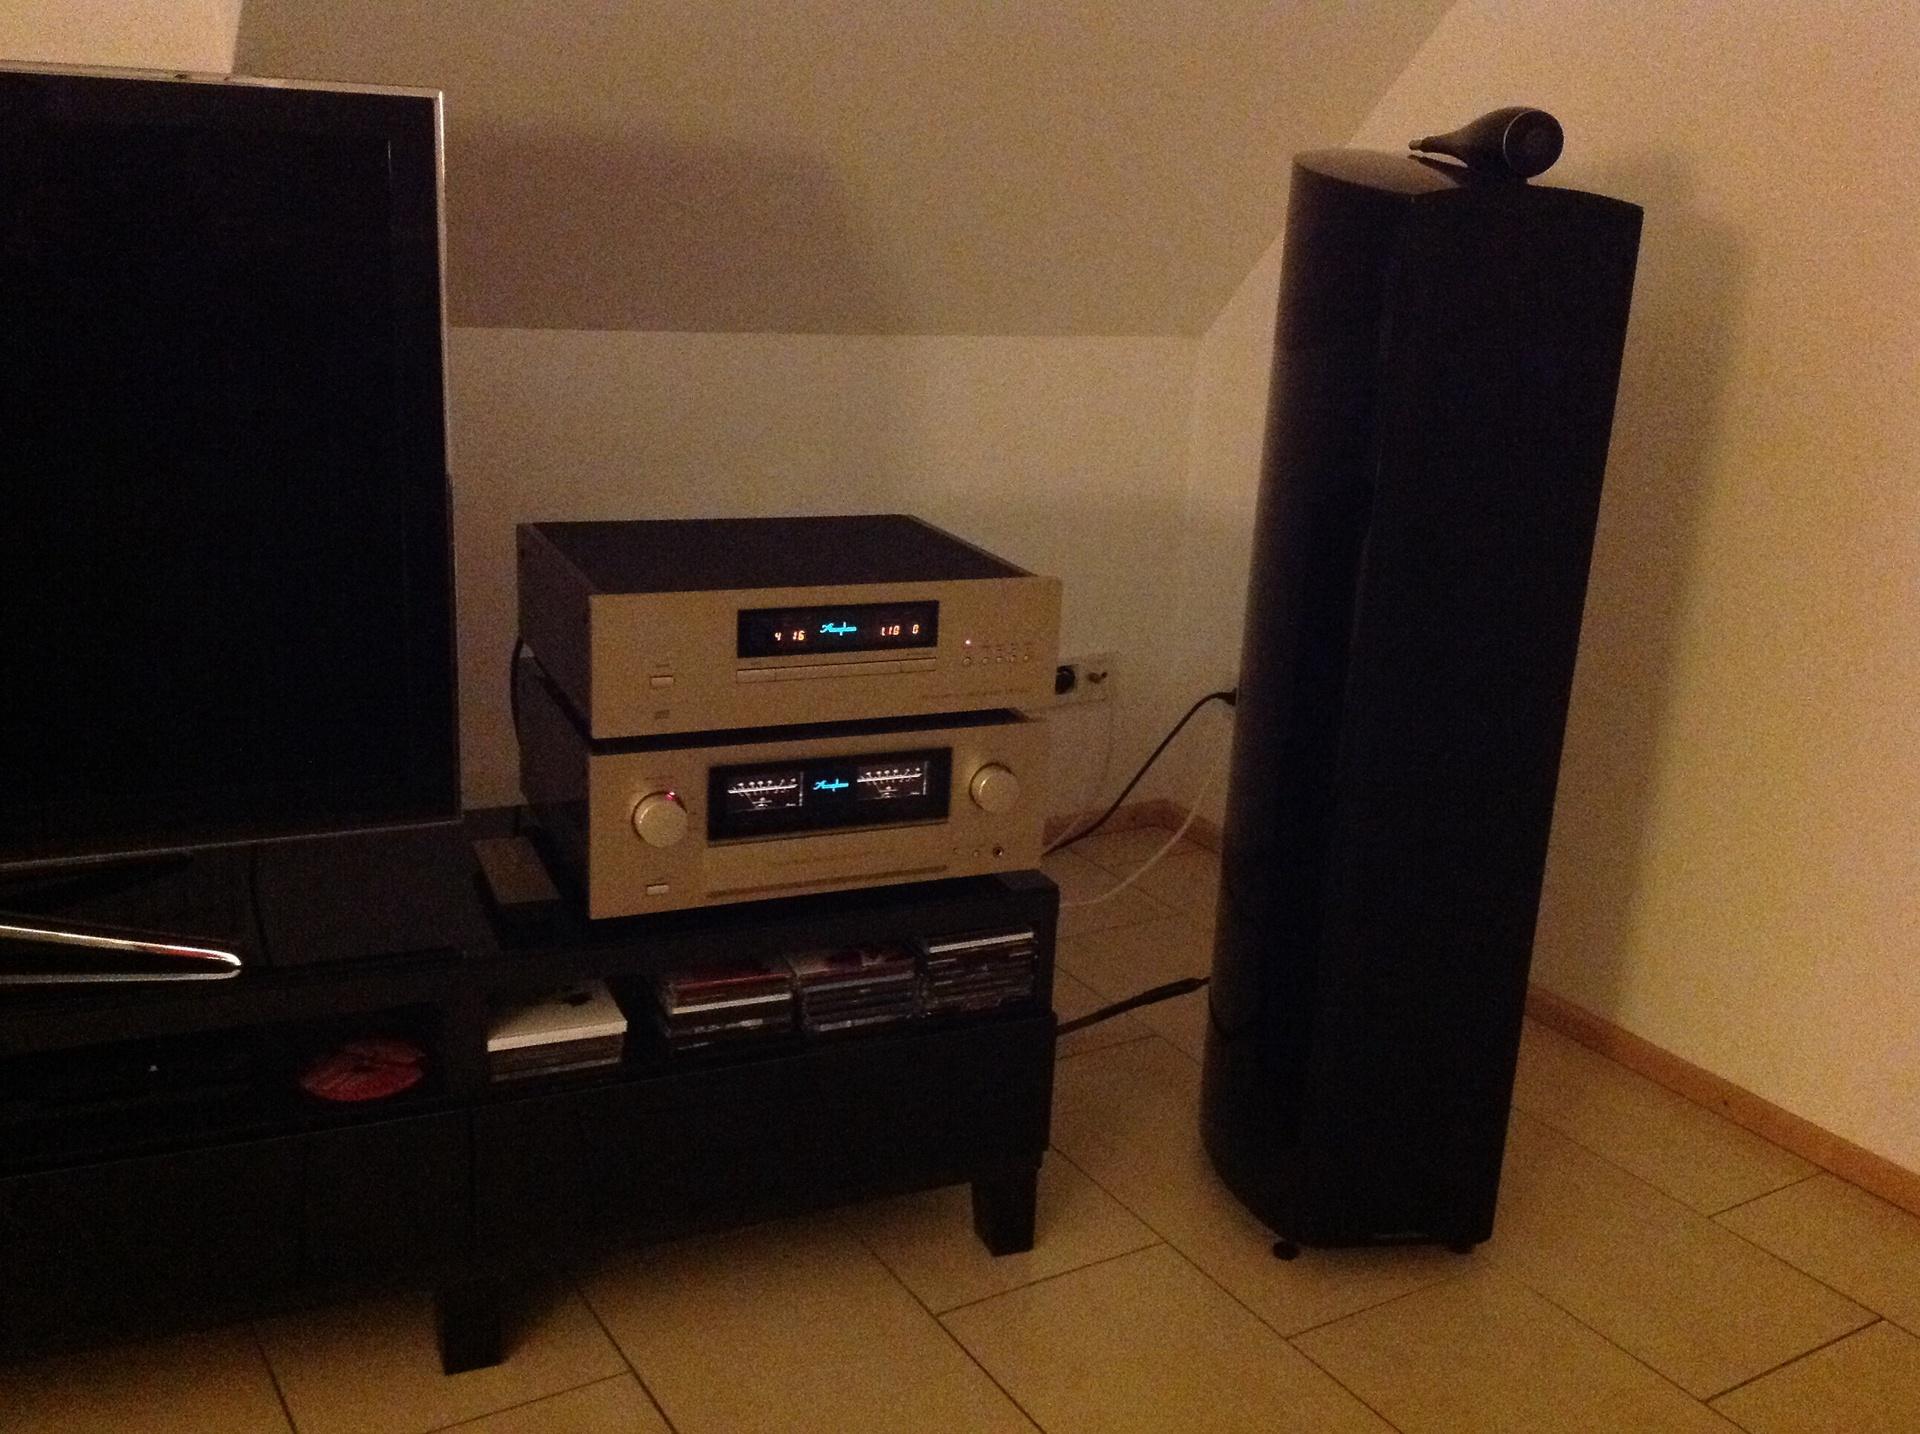 accuphase accuphase lautsprecher stereo stereoanlage hifi bildergalerie. Black Bedroom Furniture Sets. Home Design Ideas